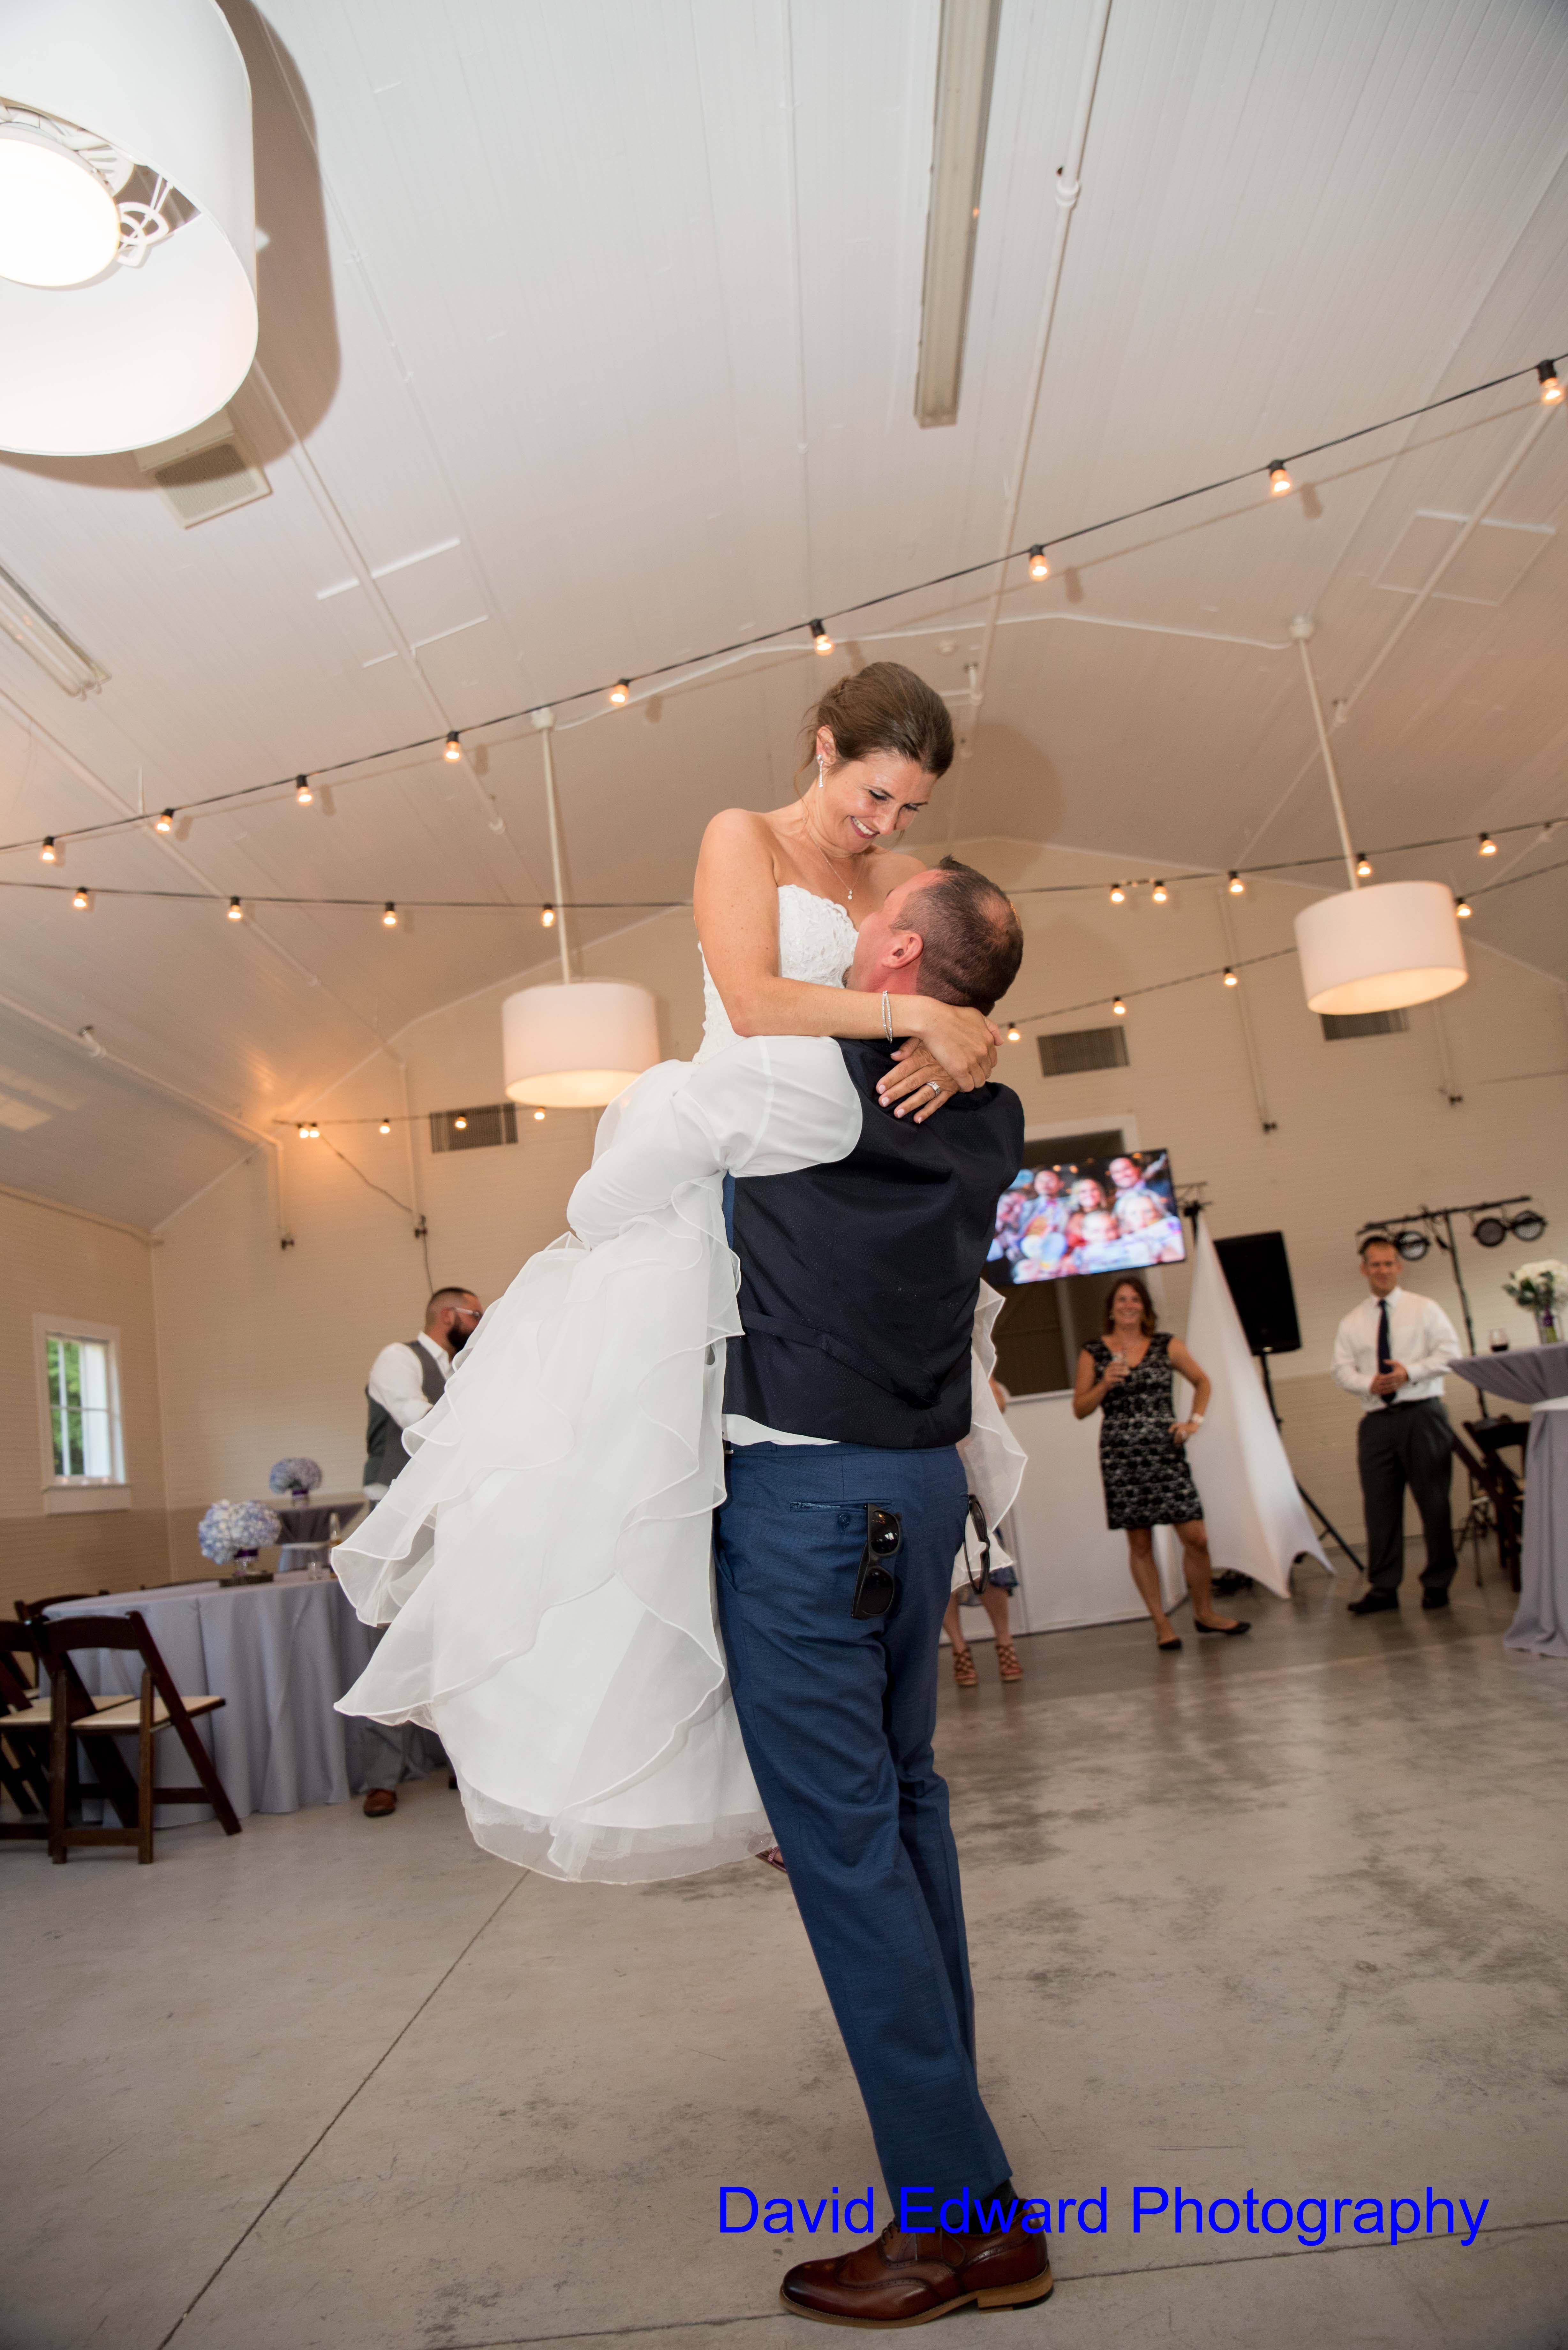 Magnificent Moments Weddings Dairy Barn David Edward Photography(18) Min